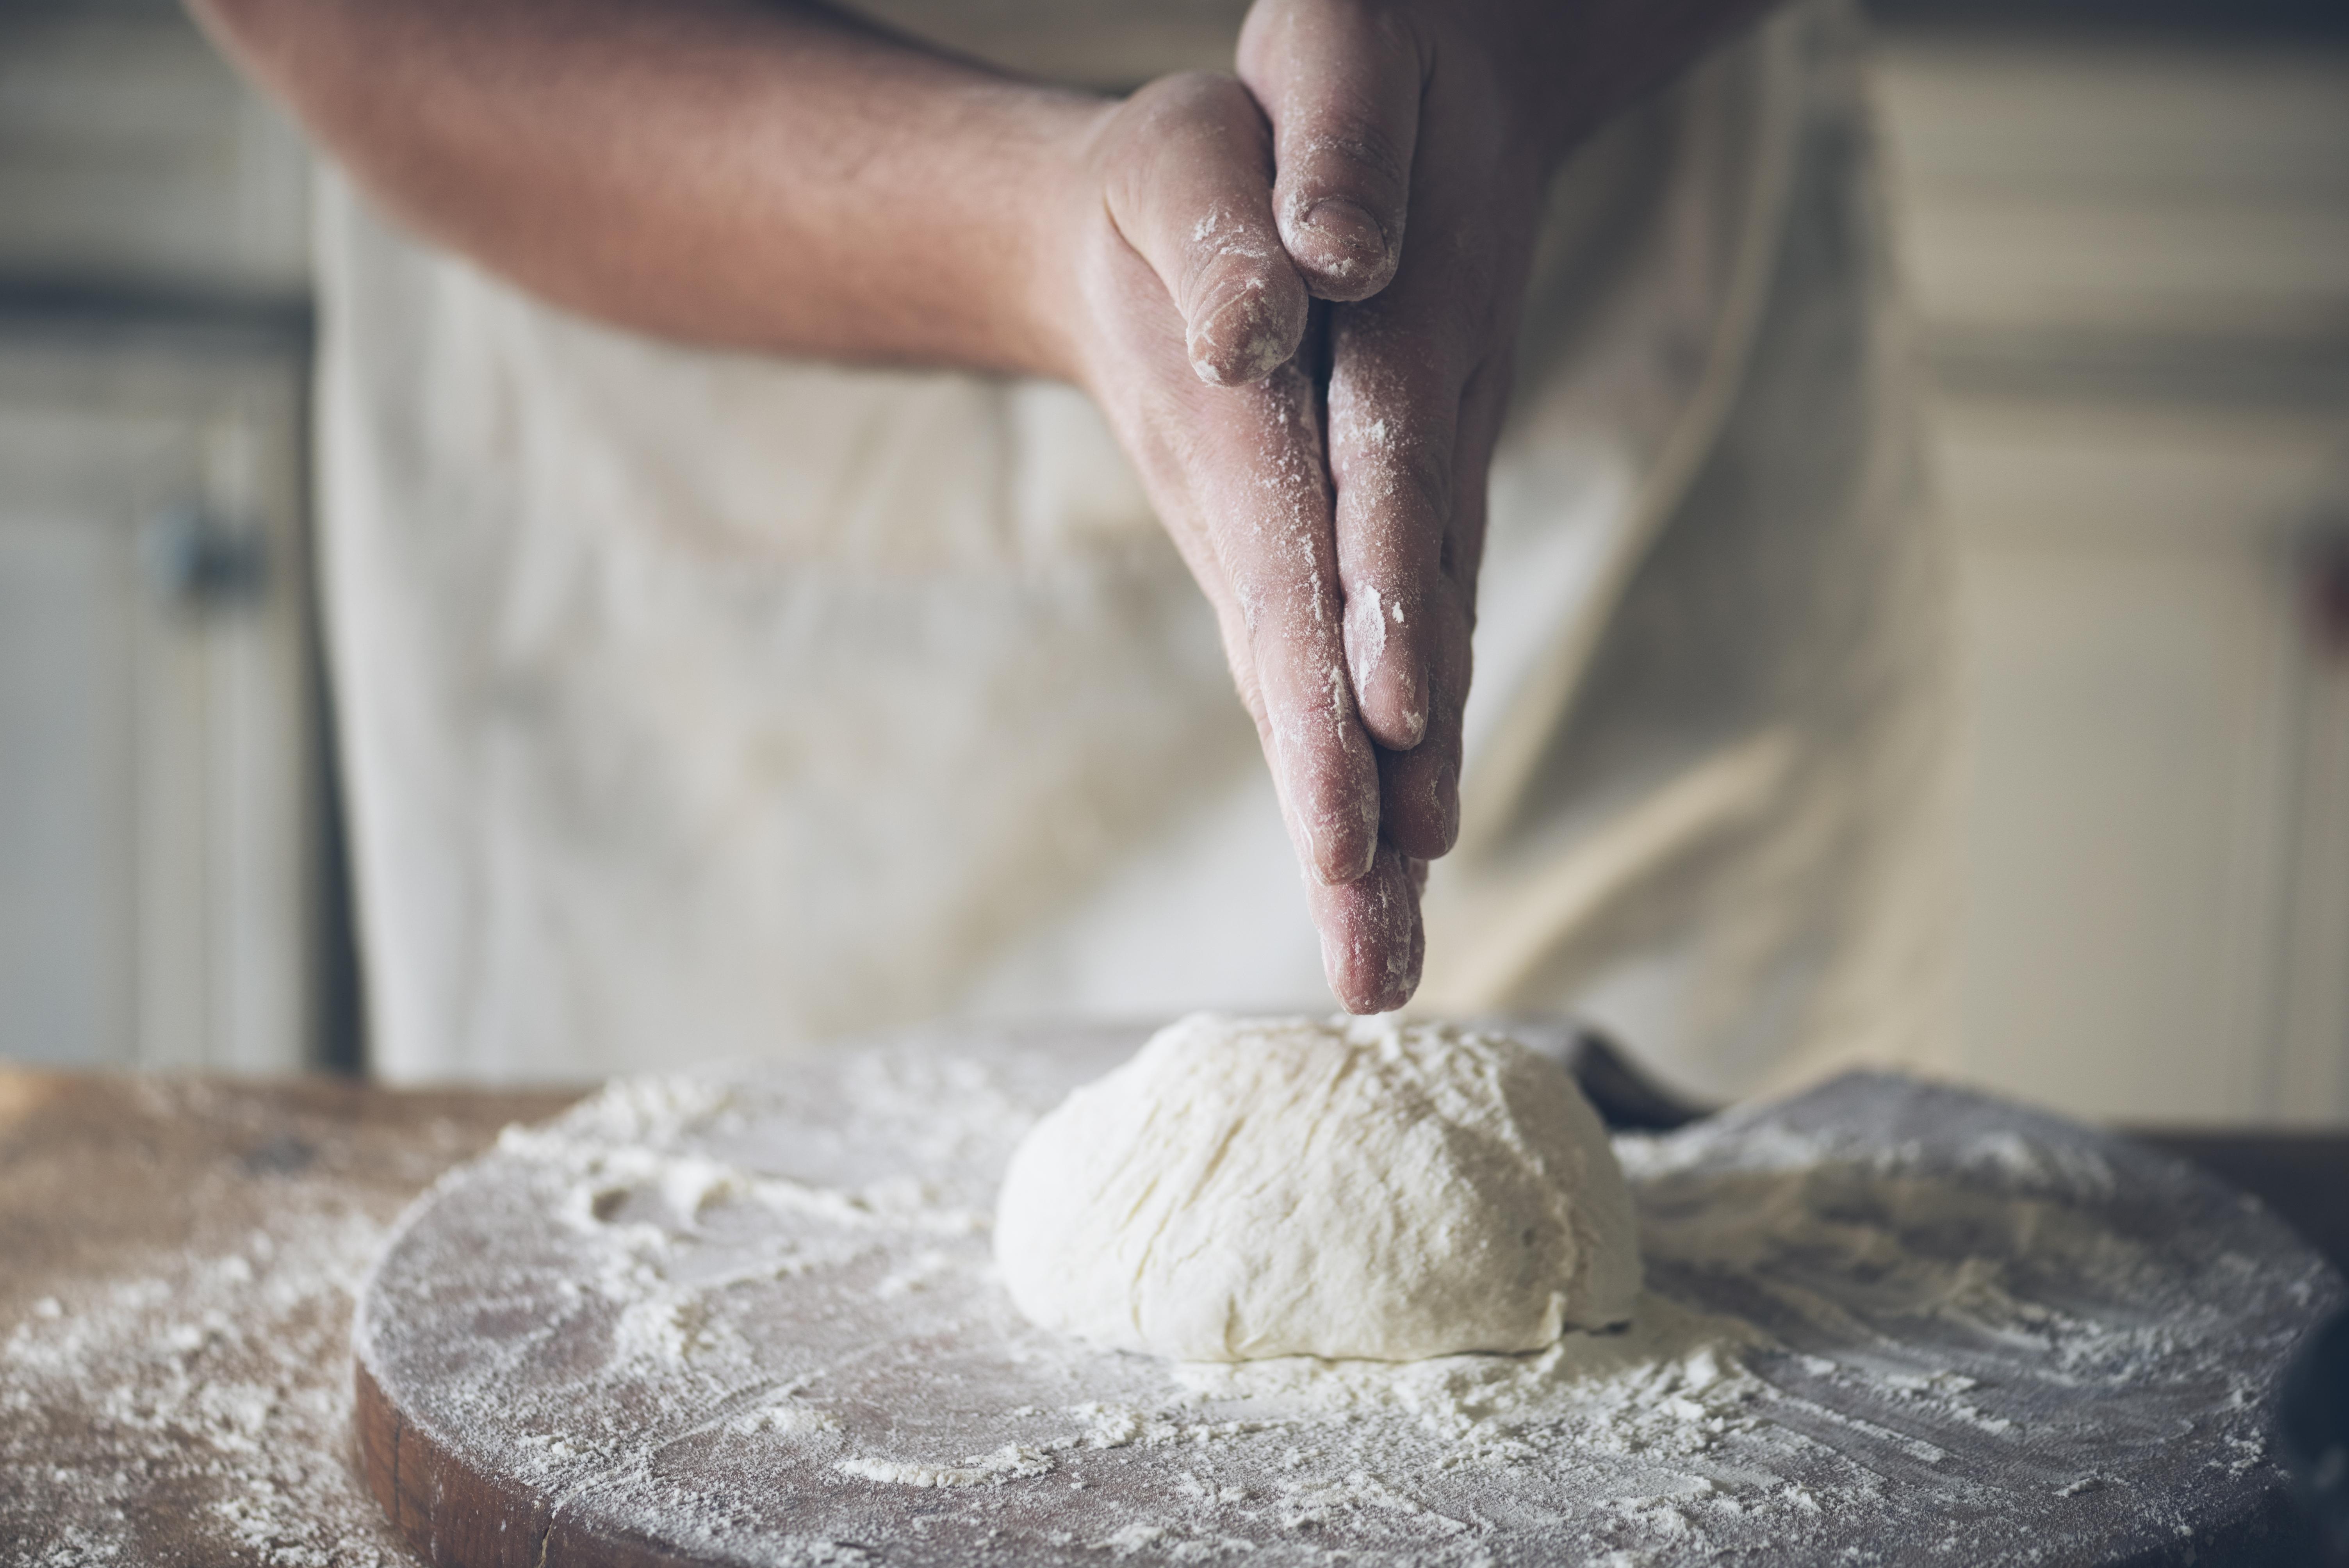 baking-bread-P6LAGHU